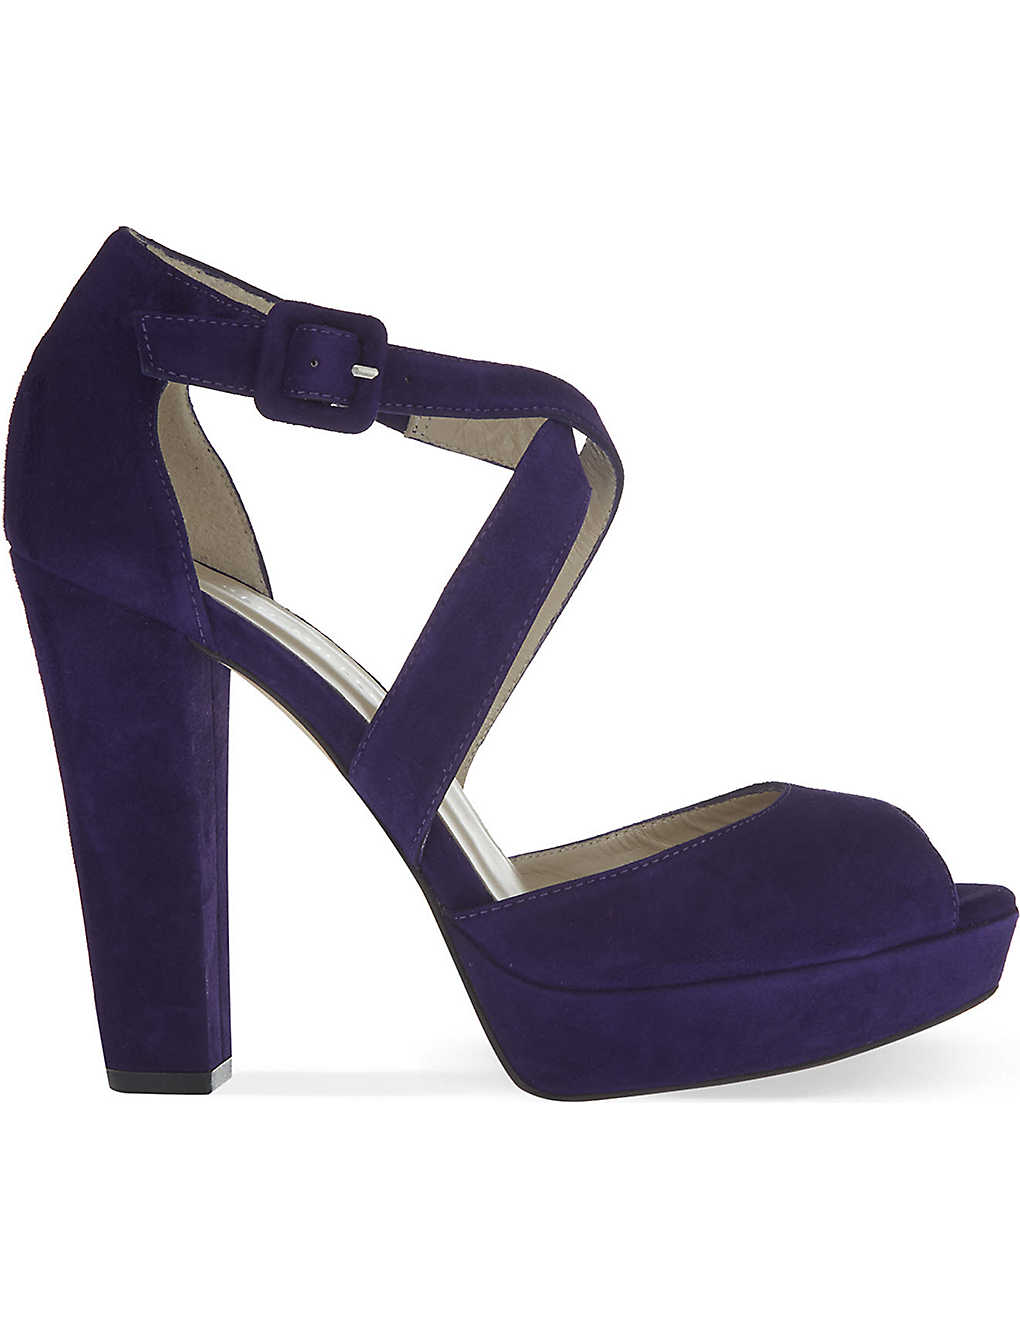 Karen Millen Suede Platform Sandals Pre Order Cheap Price PAC6NGd62